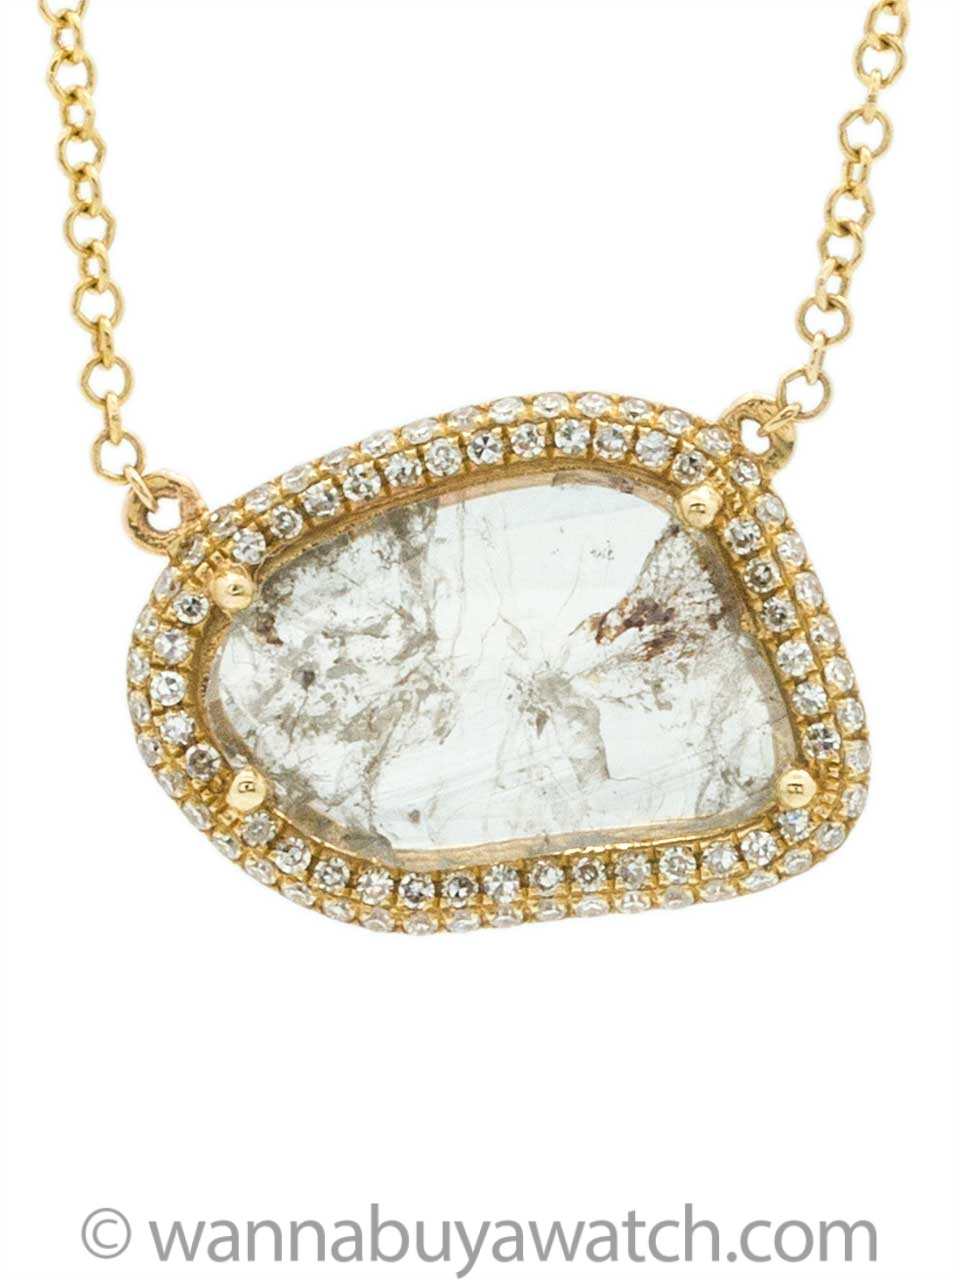 14K YG Diamond Slice Pendant